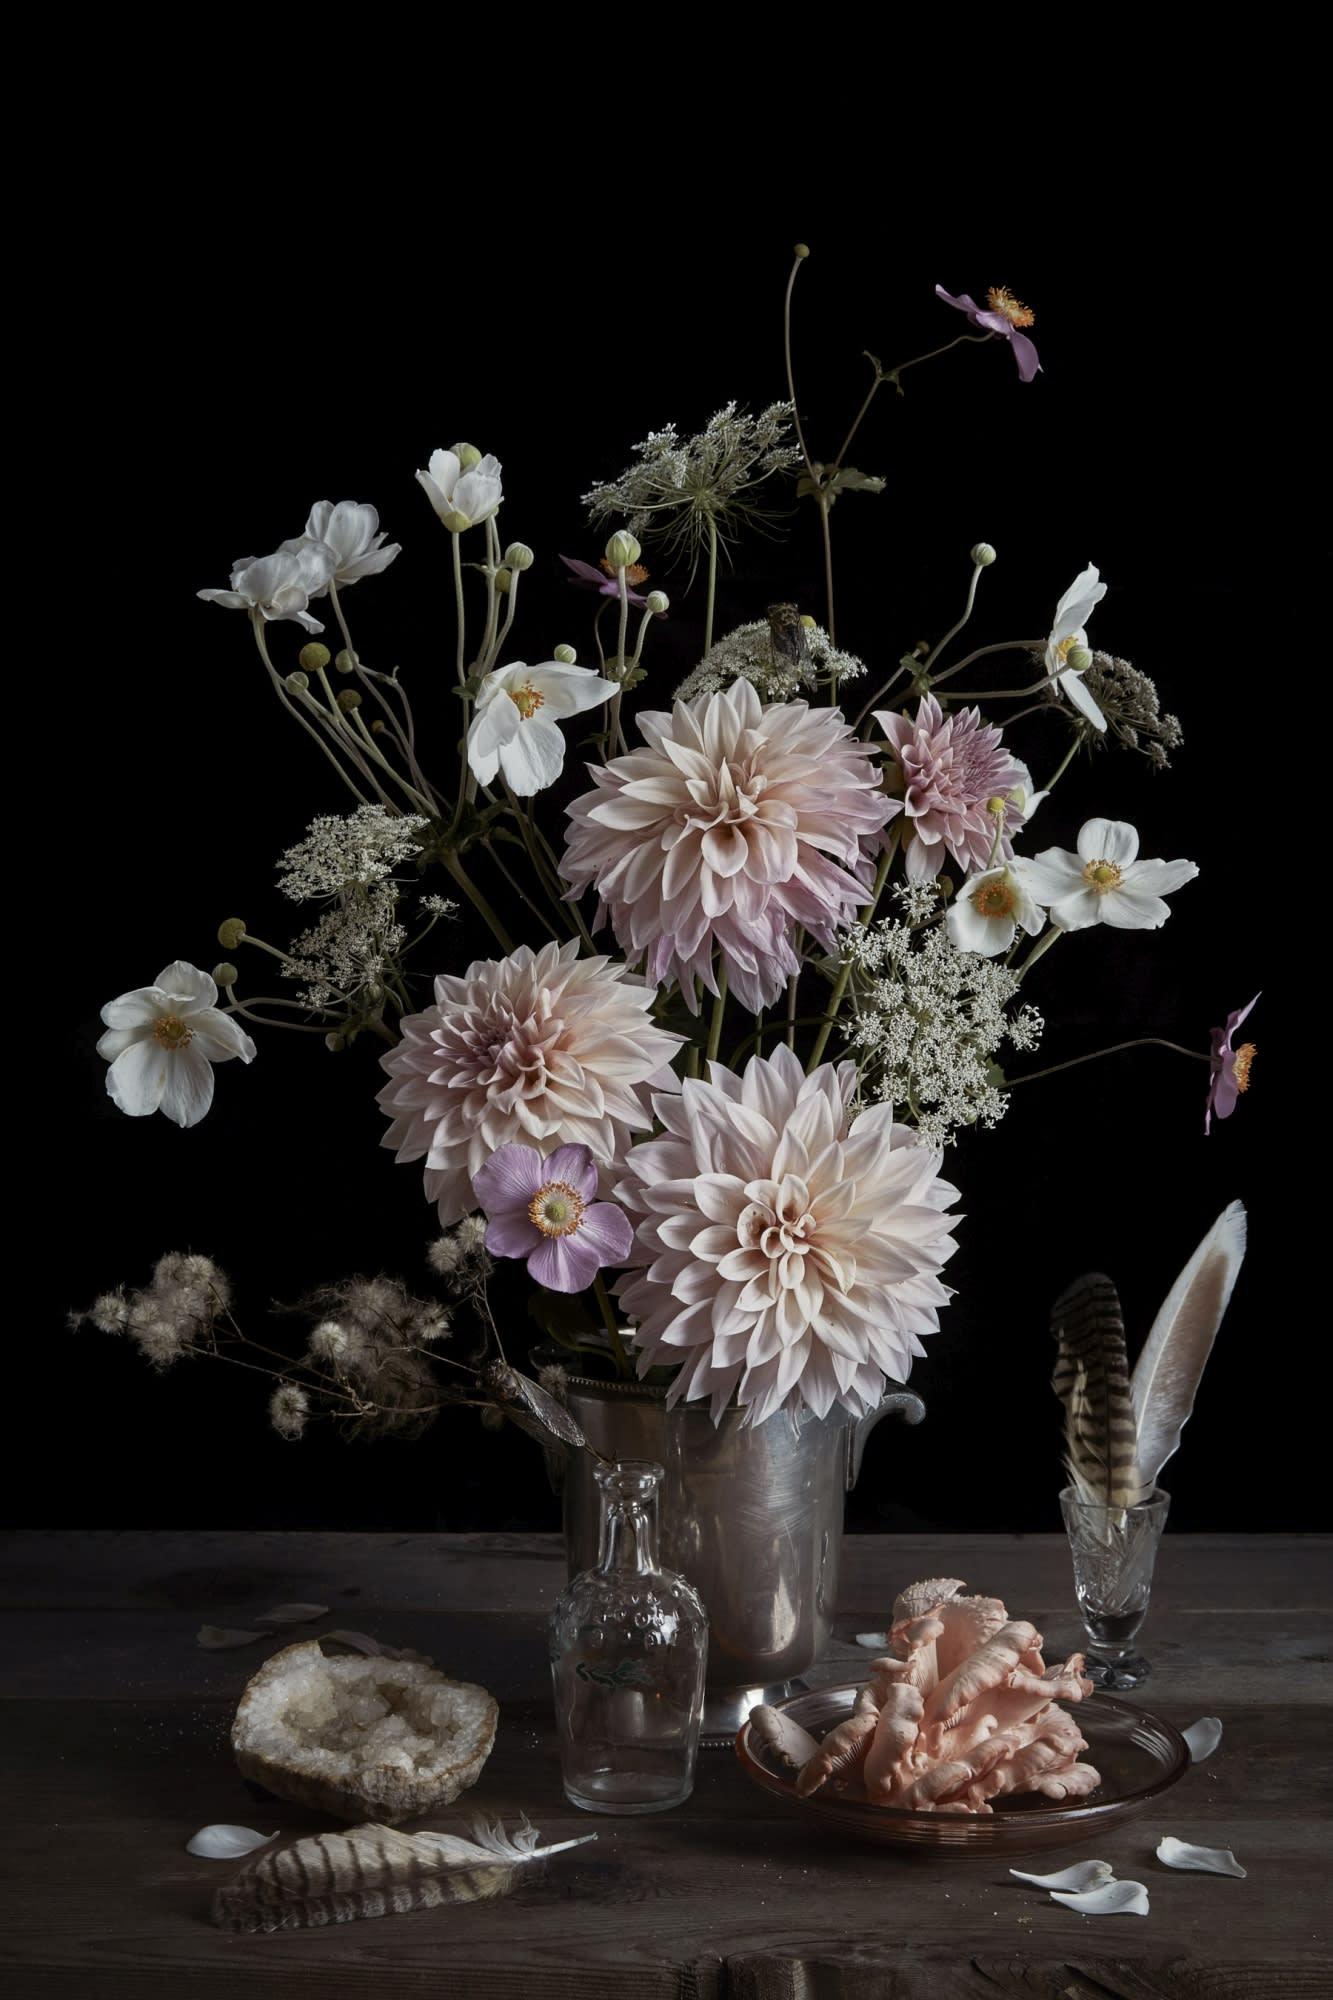 'Dahlia & Pink Oyster Mushroom' by Orlin Kristin Sjaardaat Gallery 133